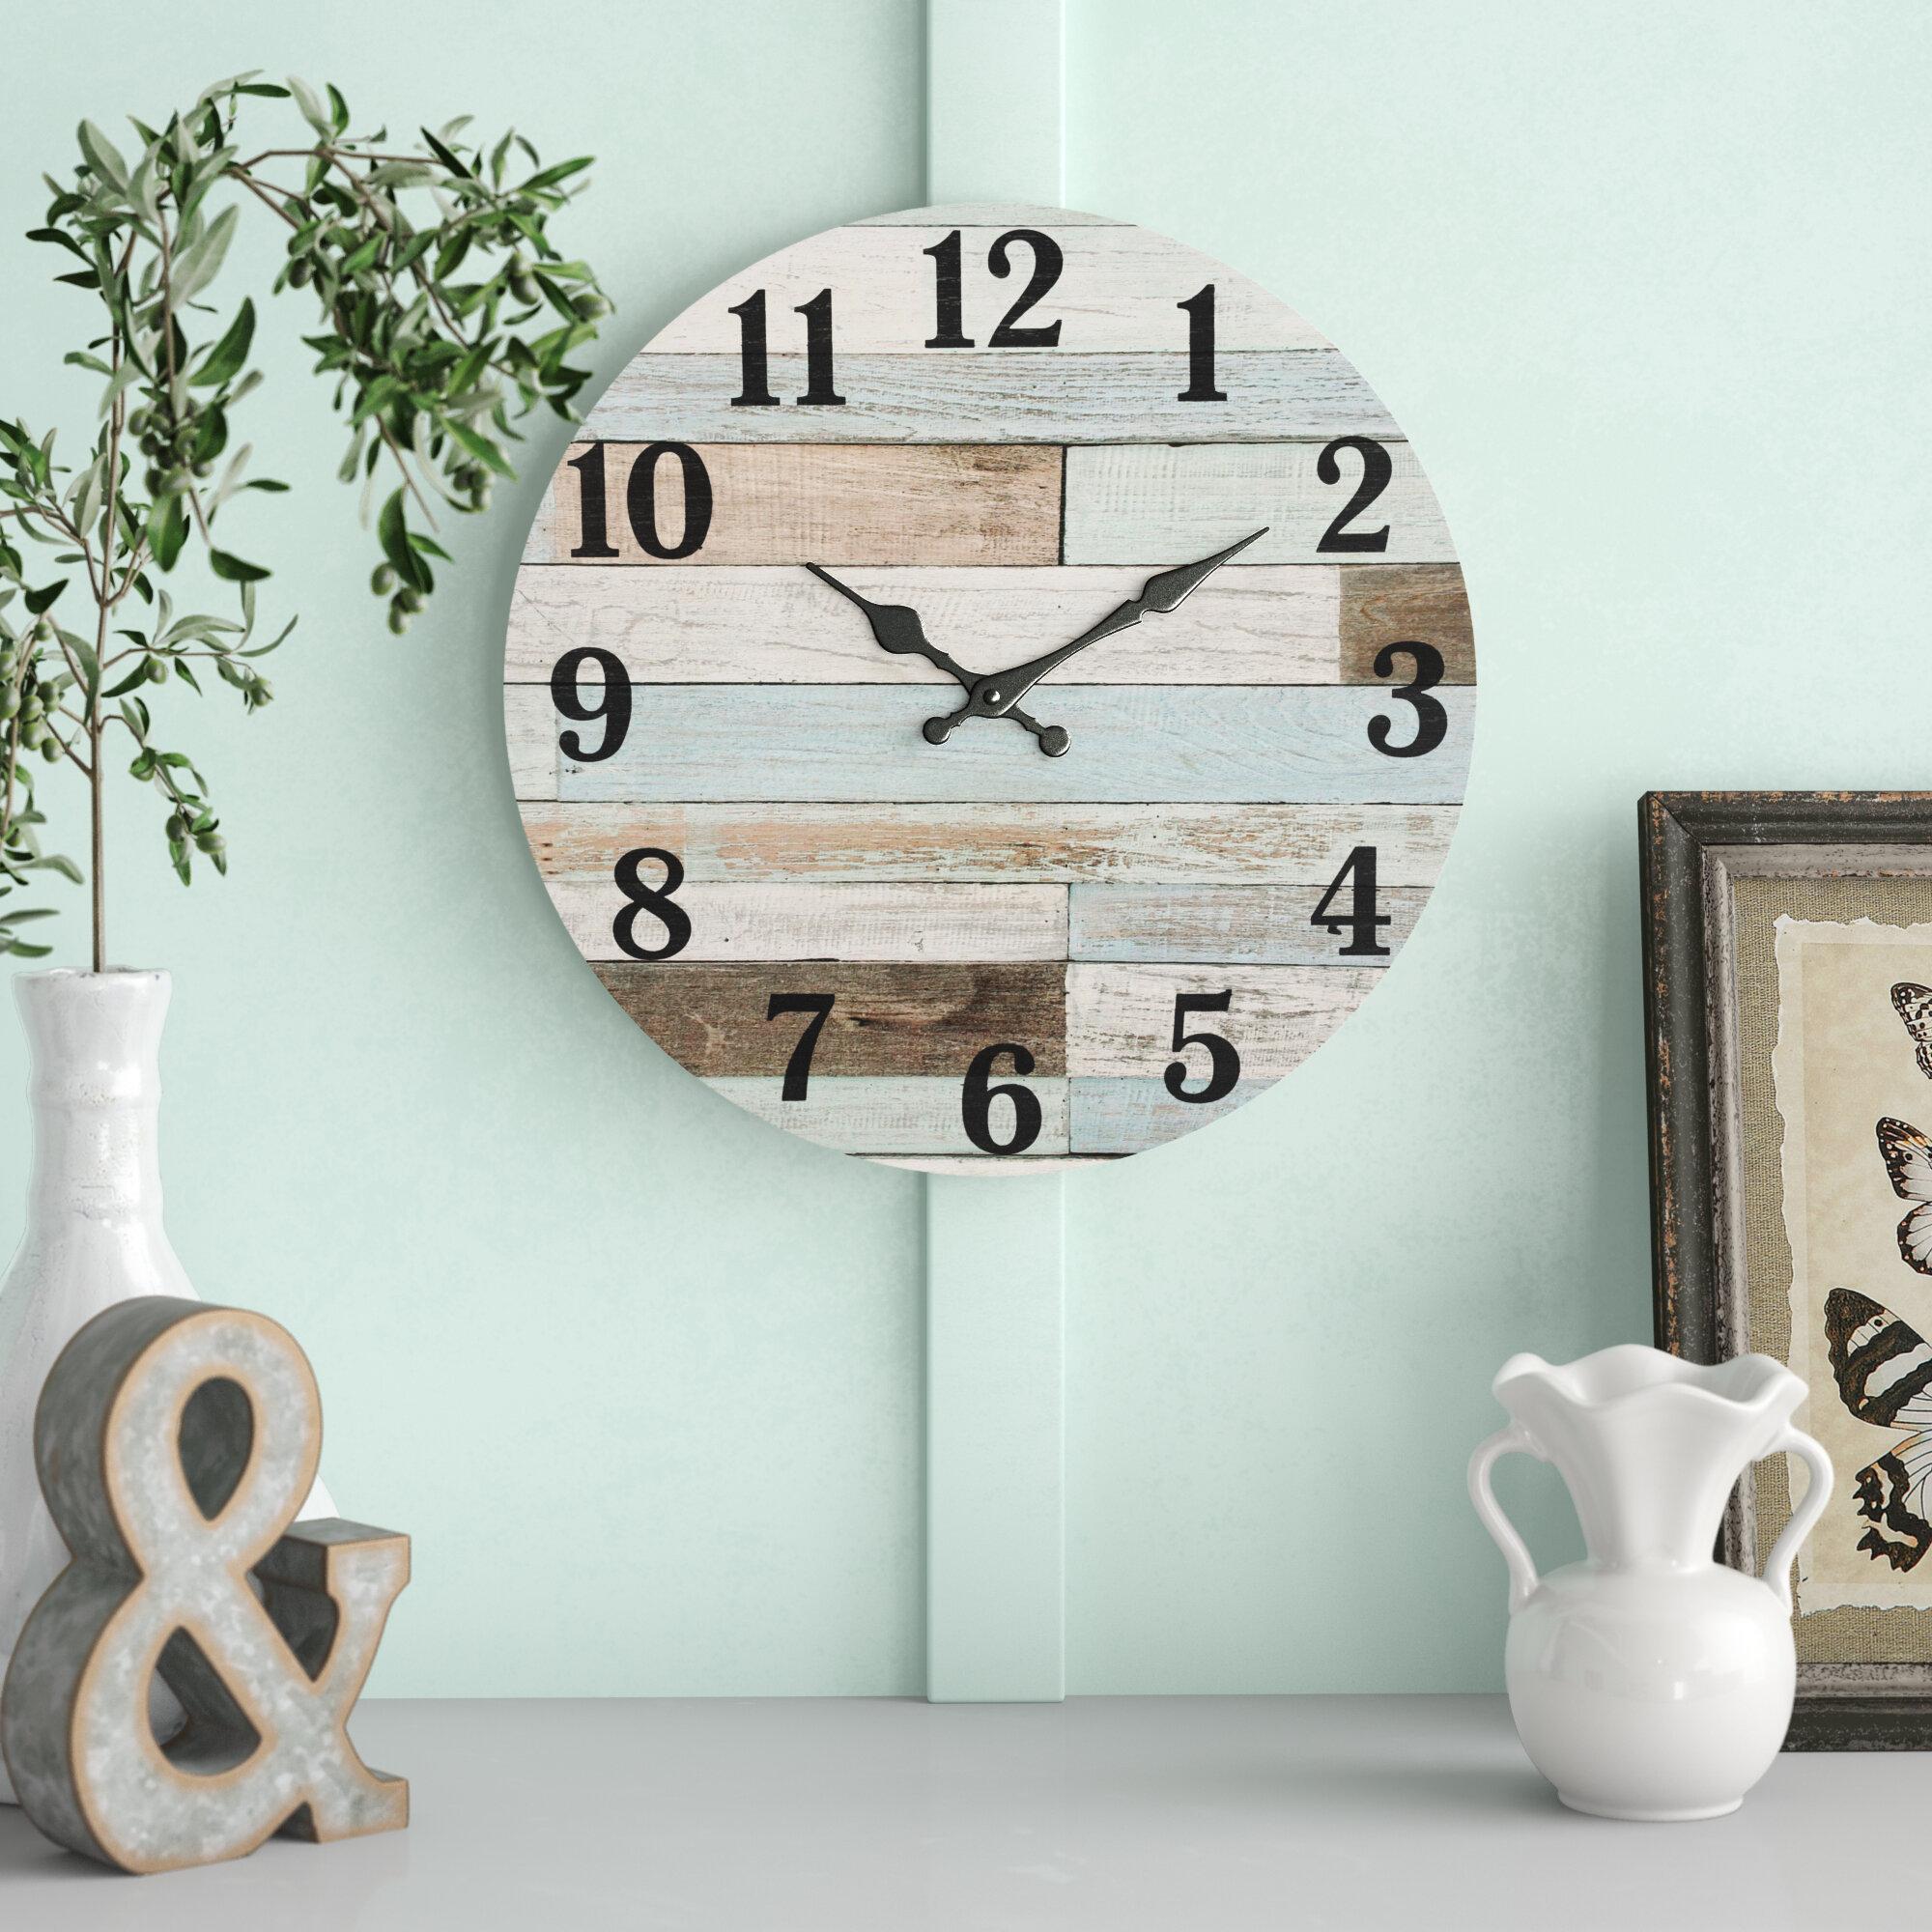 ROUND WOODEN WALL CLOCK VINTAGE RETRO ANTIQUE STYLE HOME MODERN FASHION DECOR